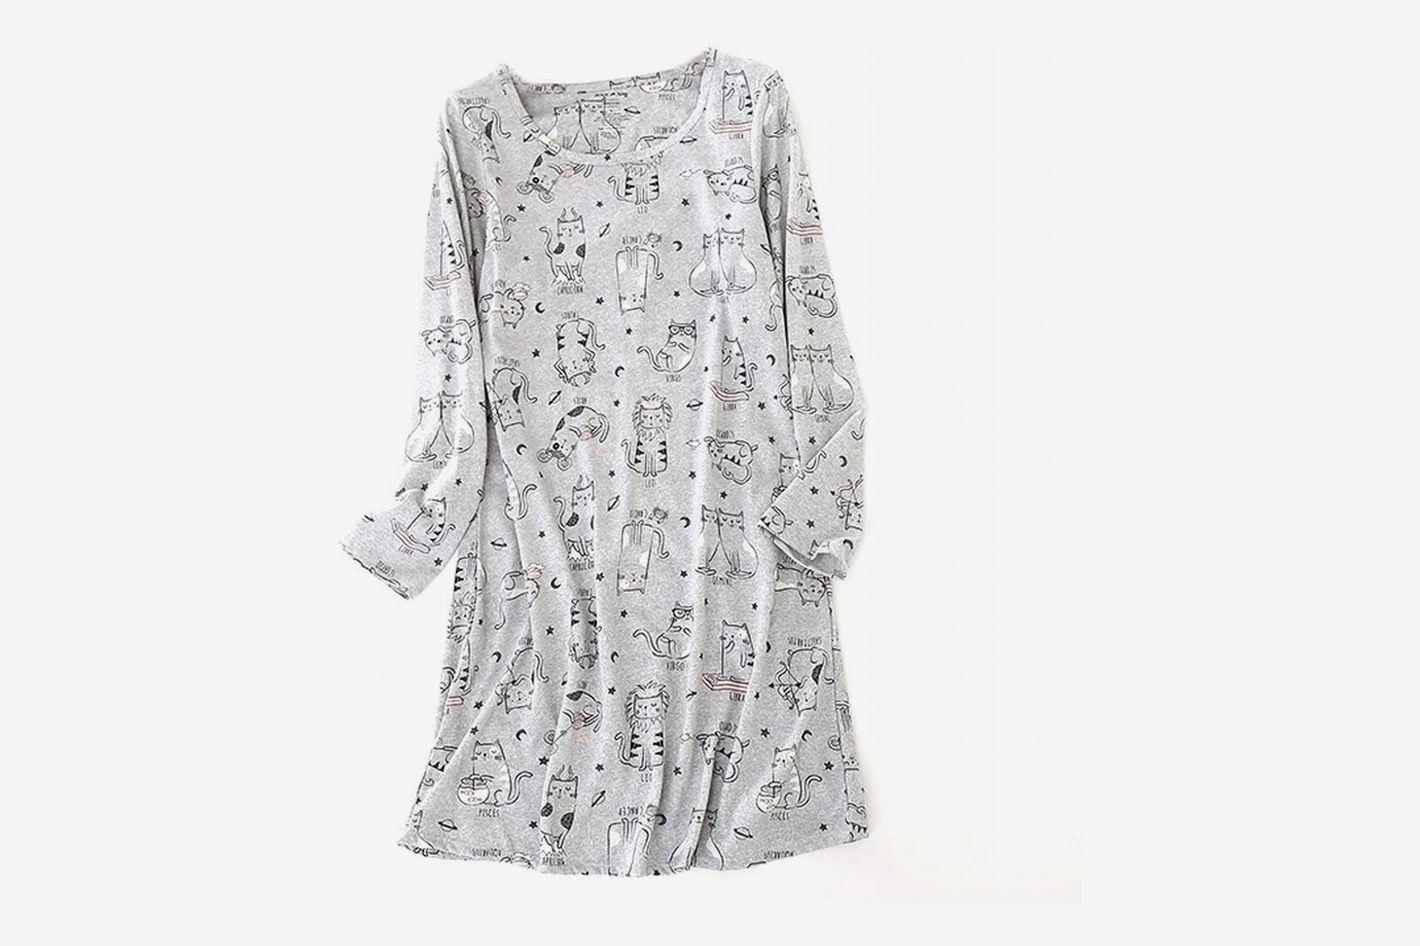 96f9d5d58d ENJOYNIGHT Women's Cotton Sleepwear Long Sleeves Nightgown